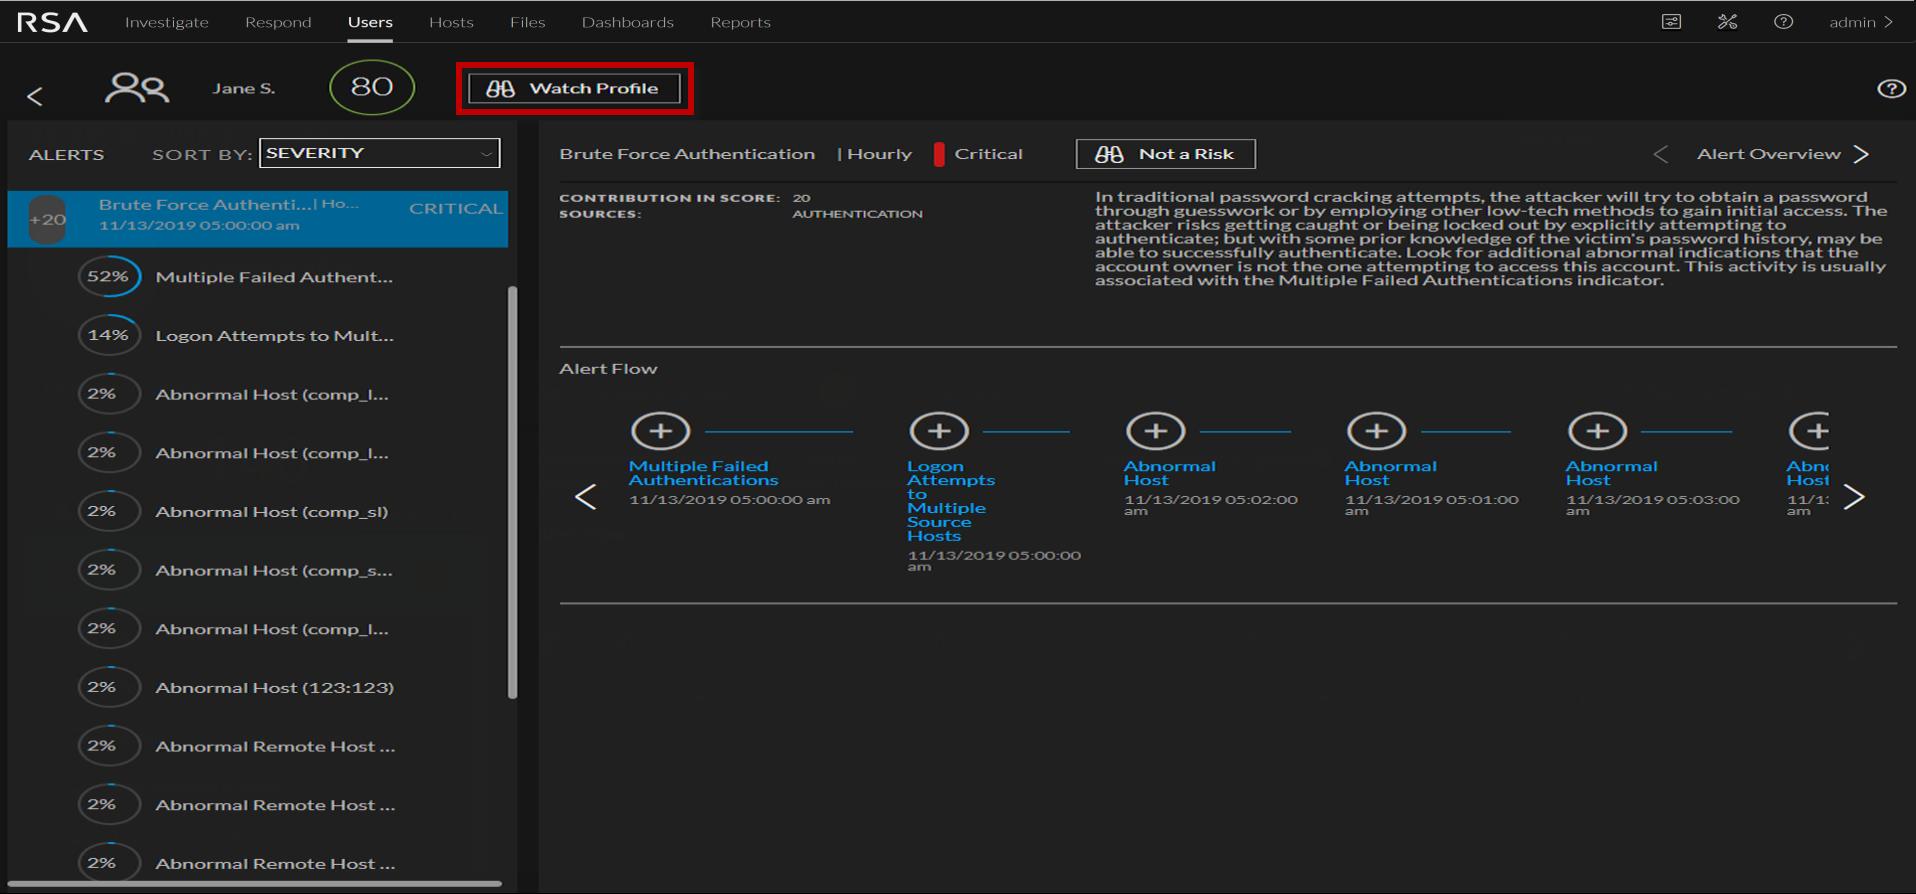 User Profile view, Watch Profile button